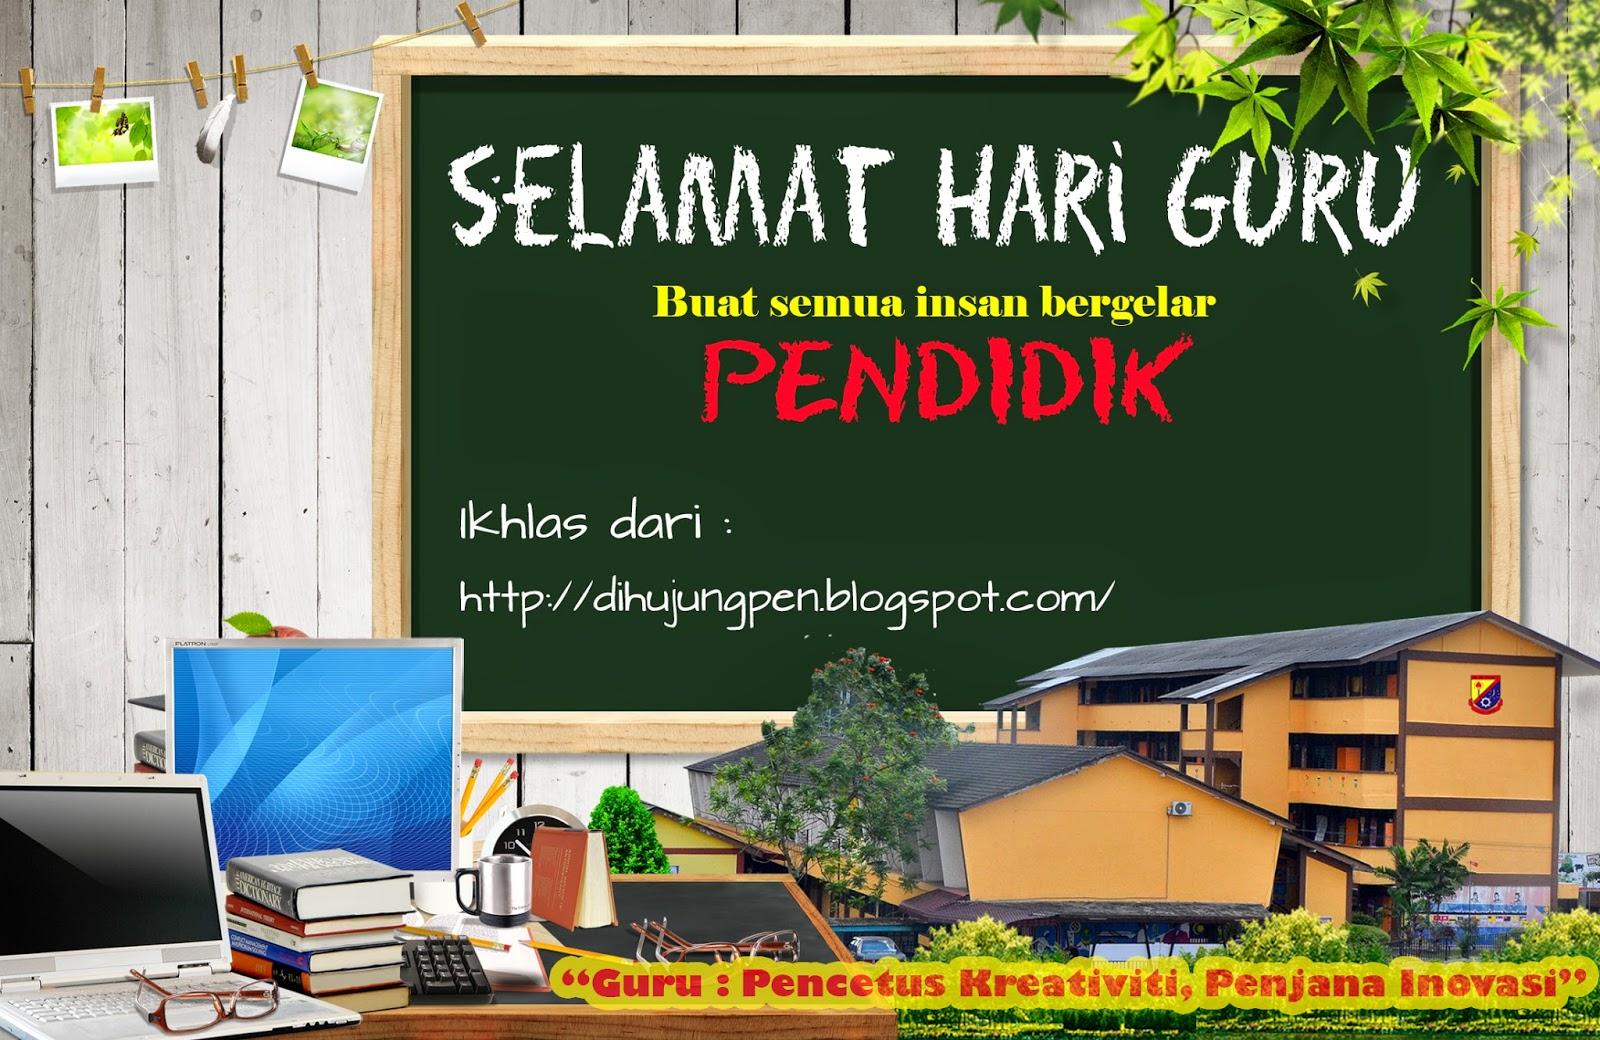 selamat hari guru 2014, agenda guru malaysia, Guru malaysia, Puisi guru malaysia,.cabaran guru malaysia, warna-warna pendidikan, Happy Teacher Day